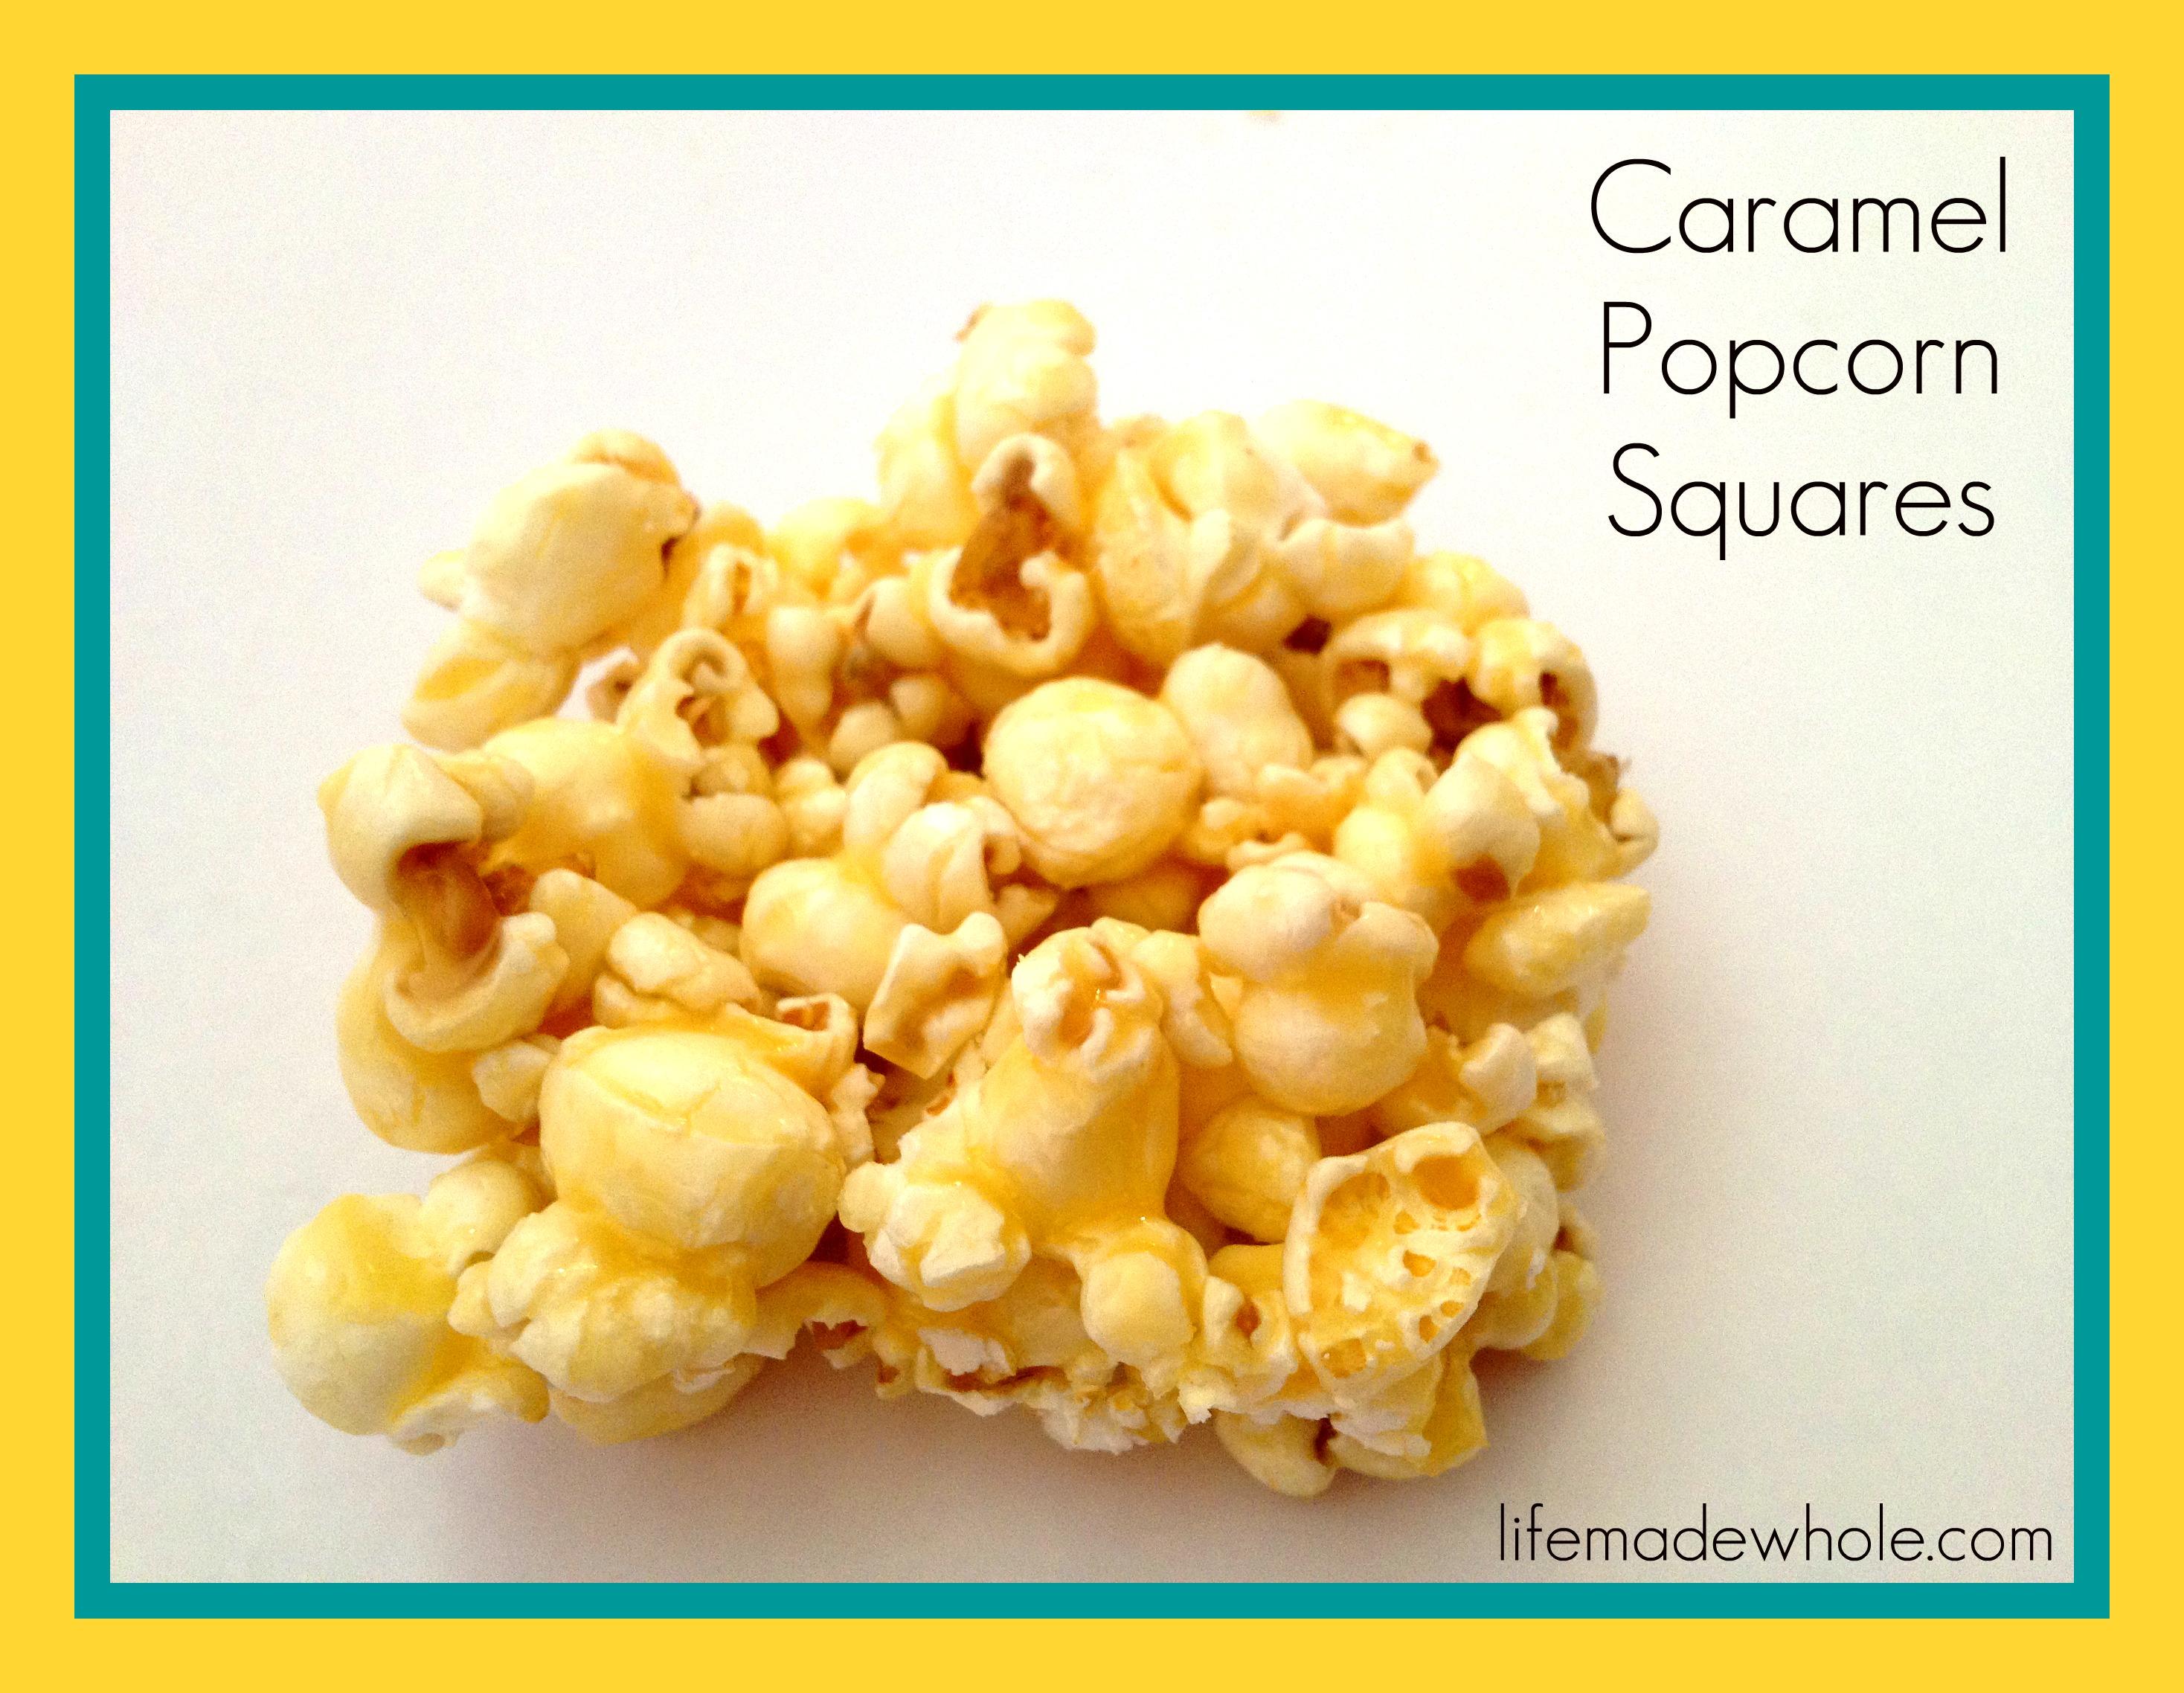 Healthified Caramel Popcorn Squares | Life Made Whole